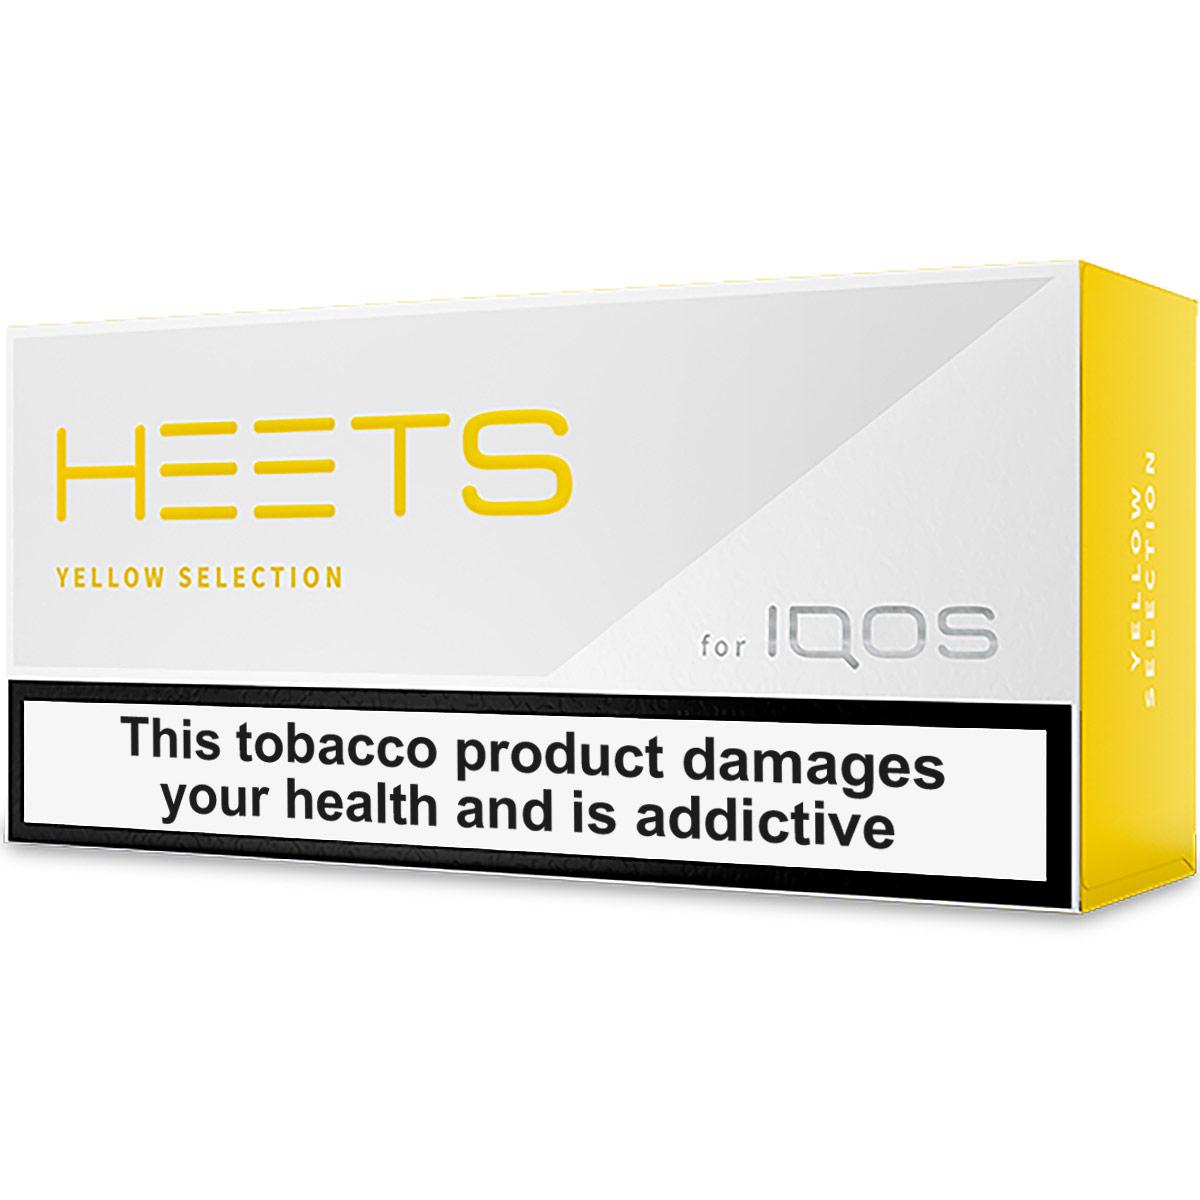 Heets - Yellow Selection